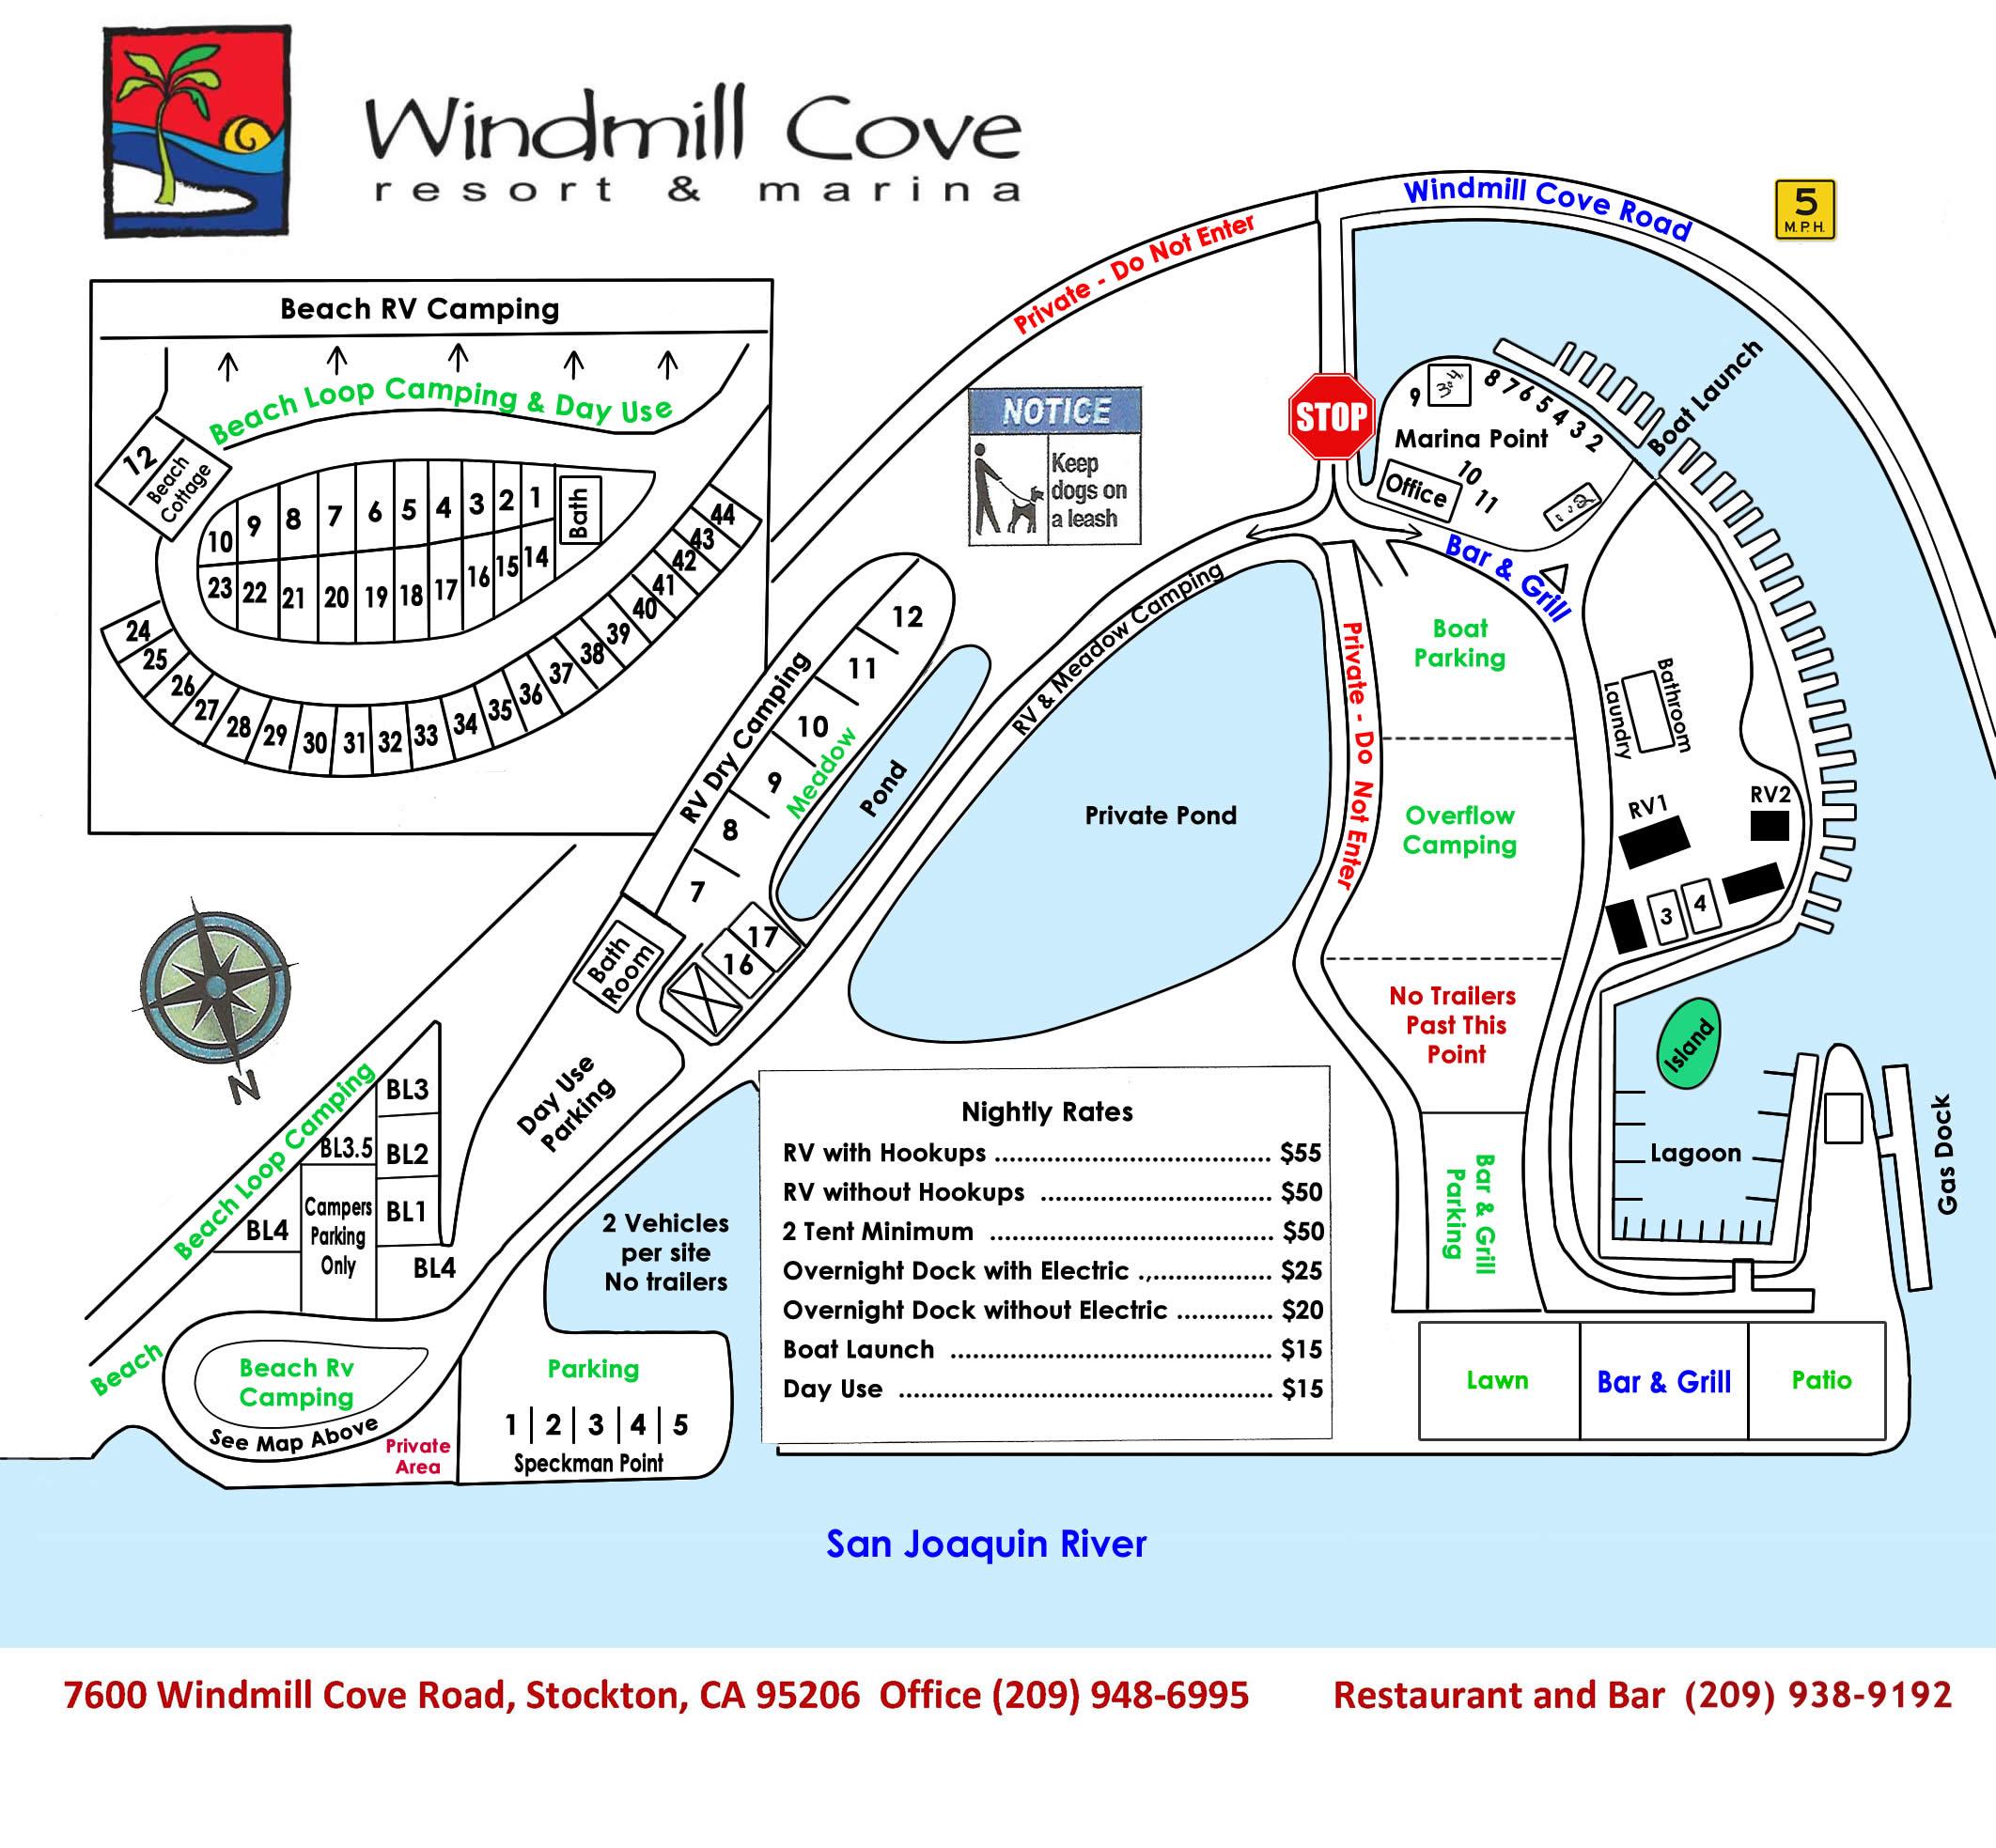 Windmill Cove Resort Map